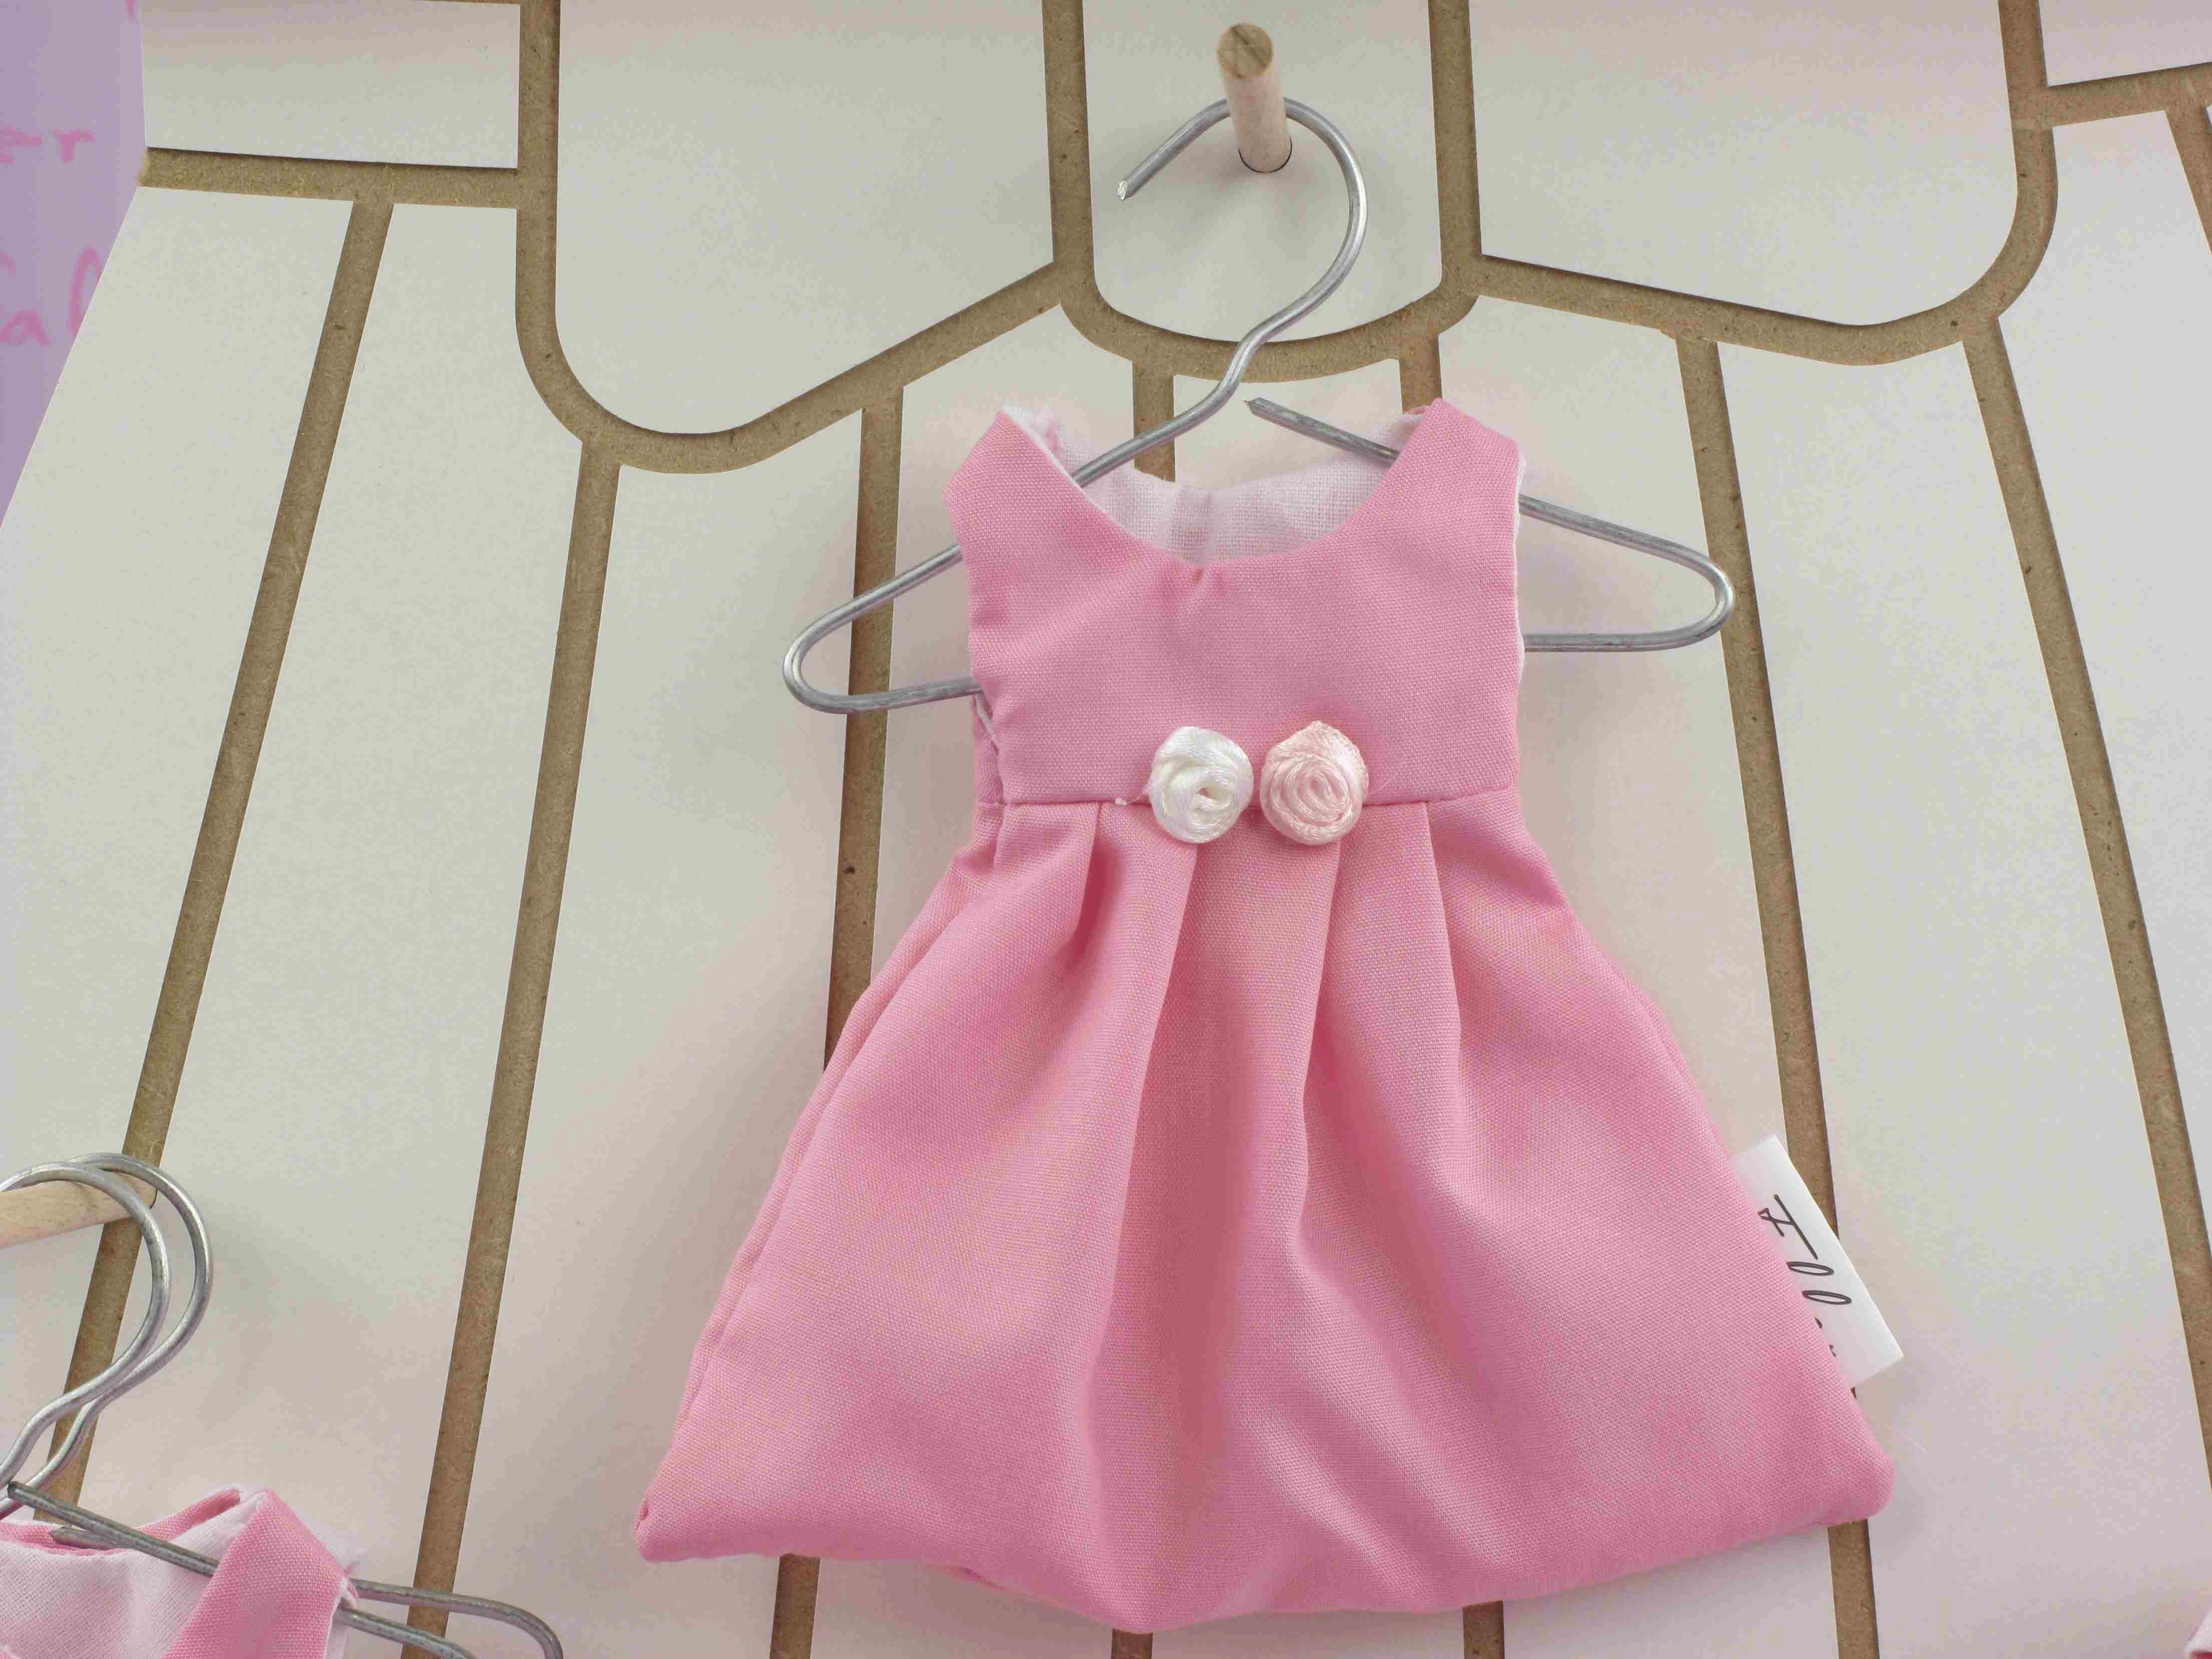 1bd024f8622cb Dragées robe - Dragées baptême fille dans petite robe